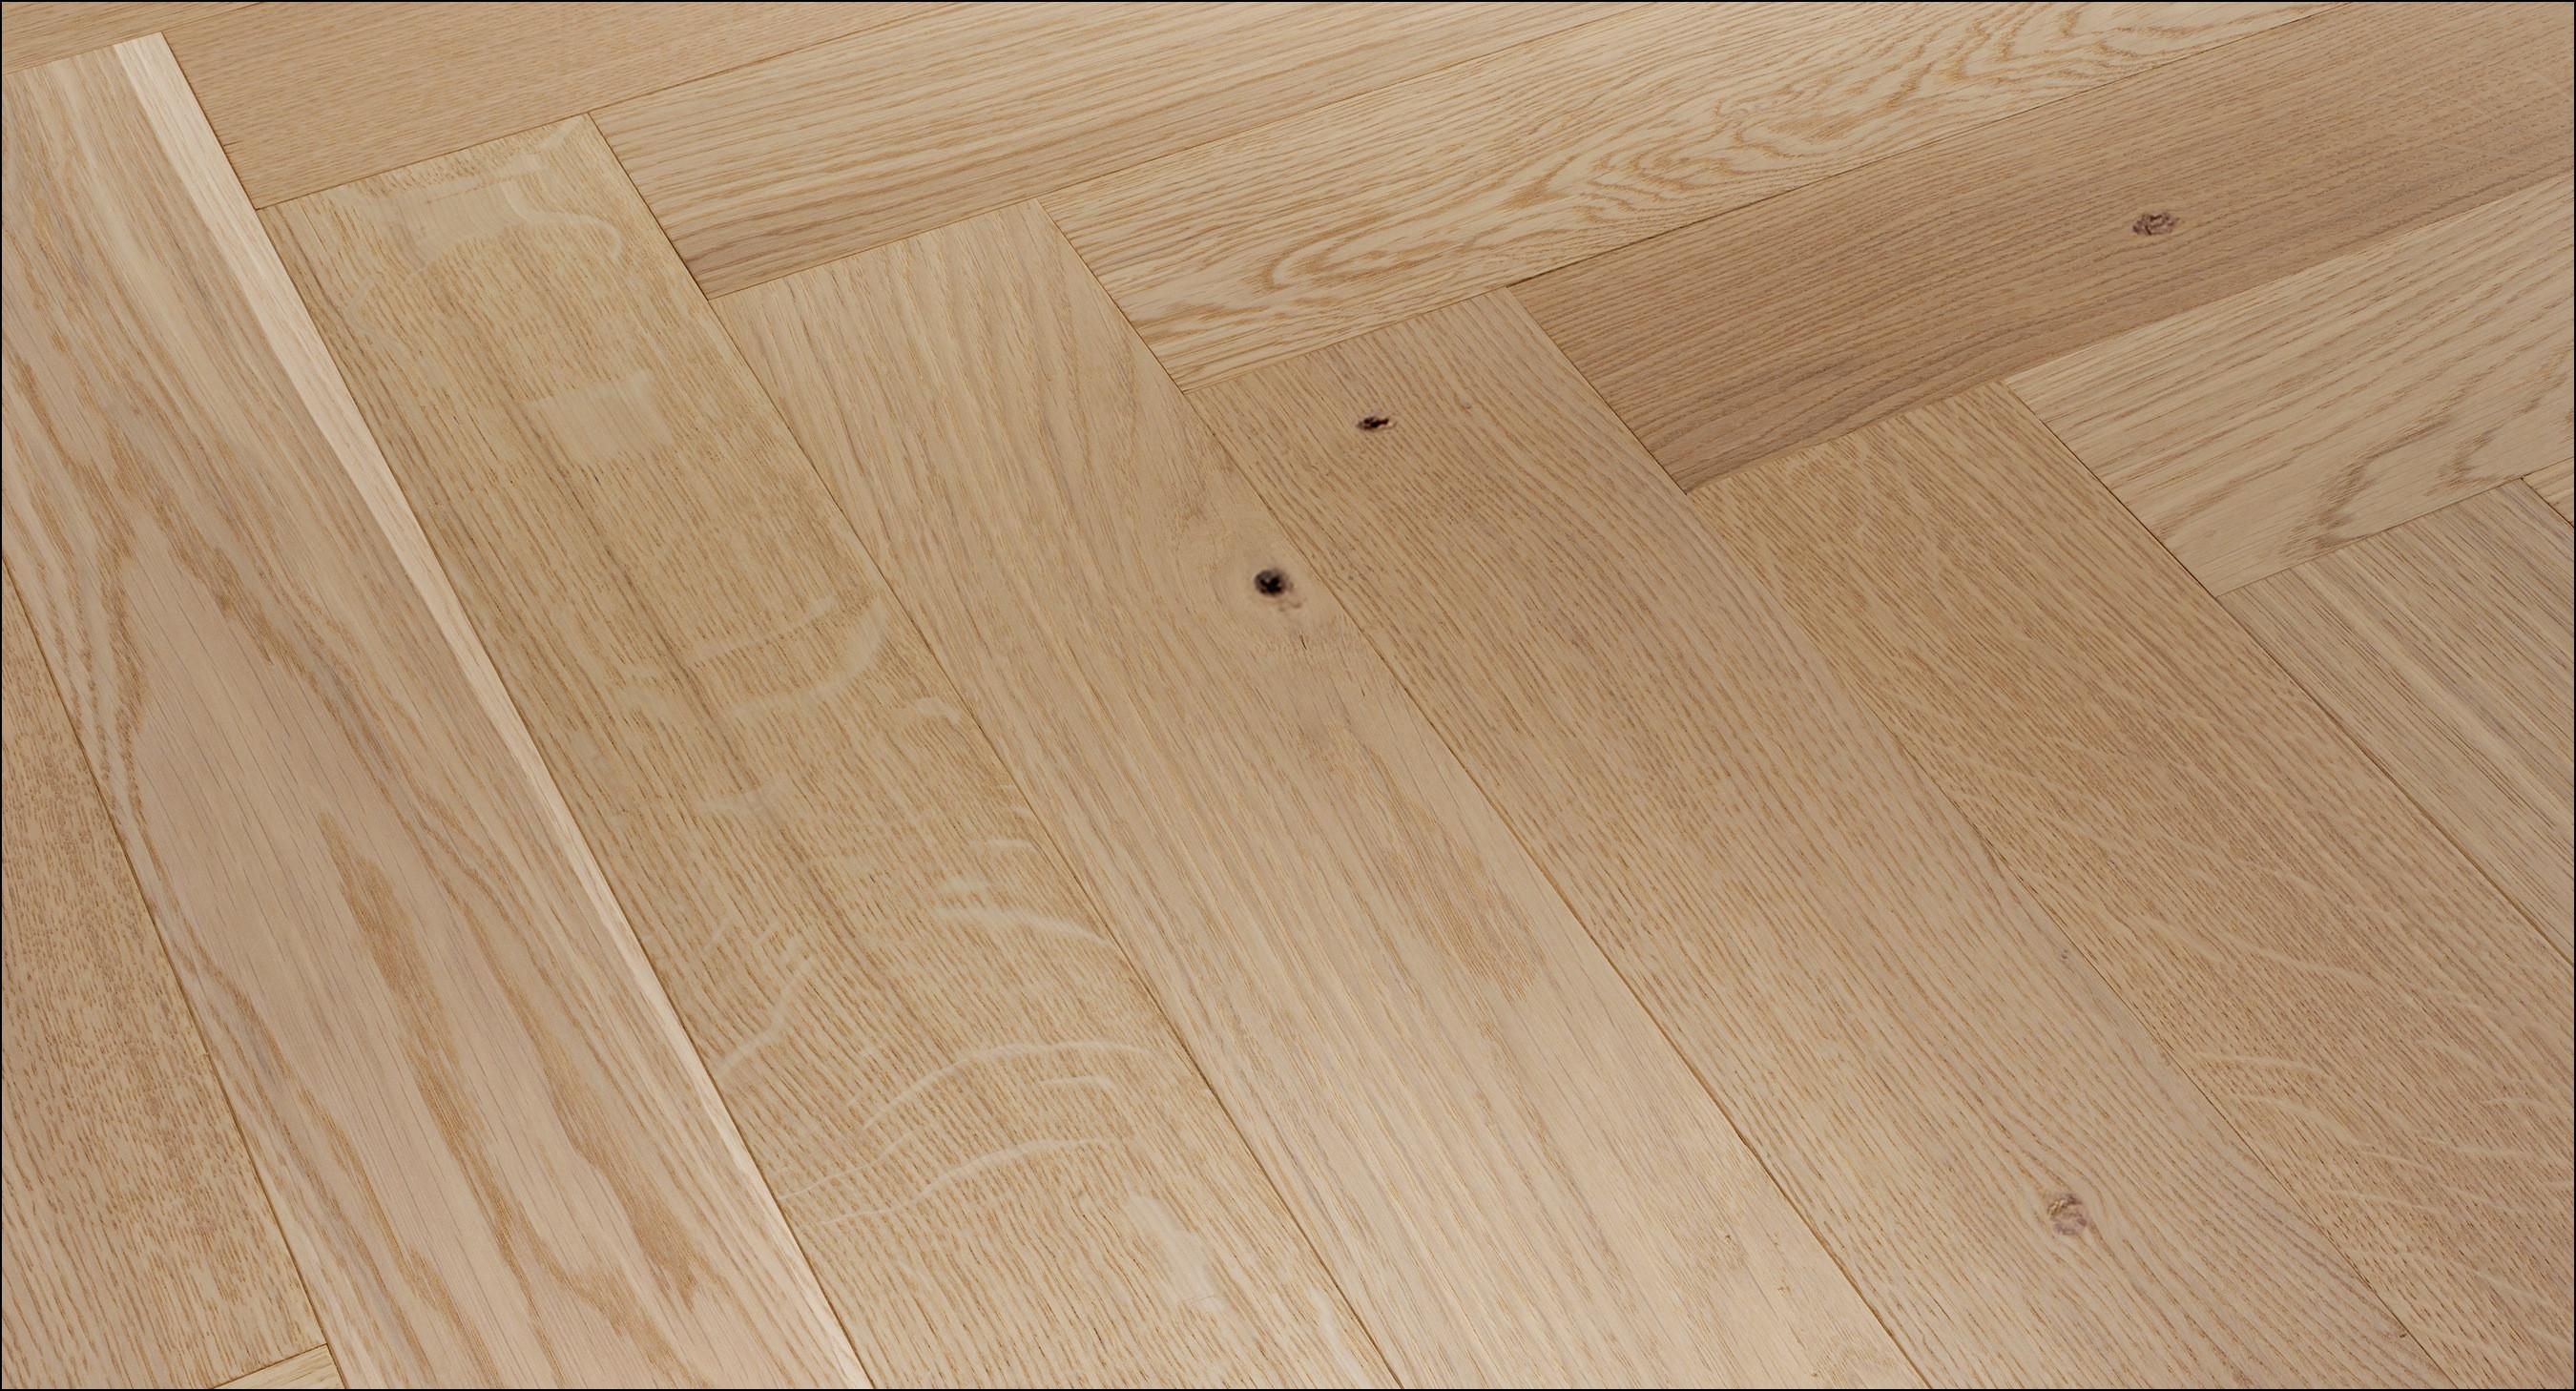 jasper prefinished oak hardwood flooring of best place flooring ideas in best place to buy engineered hardwood flooring collection trendtime engineered wood flooring products of best place